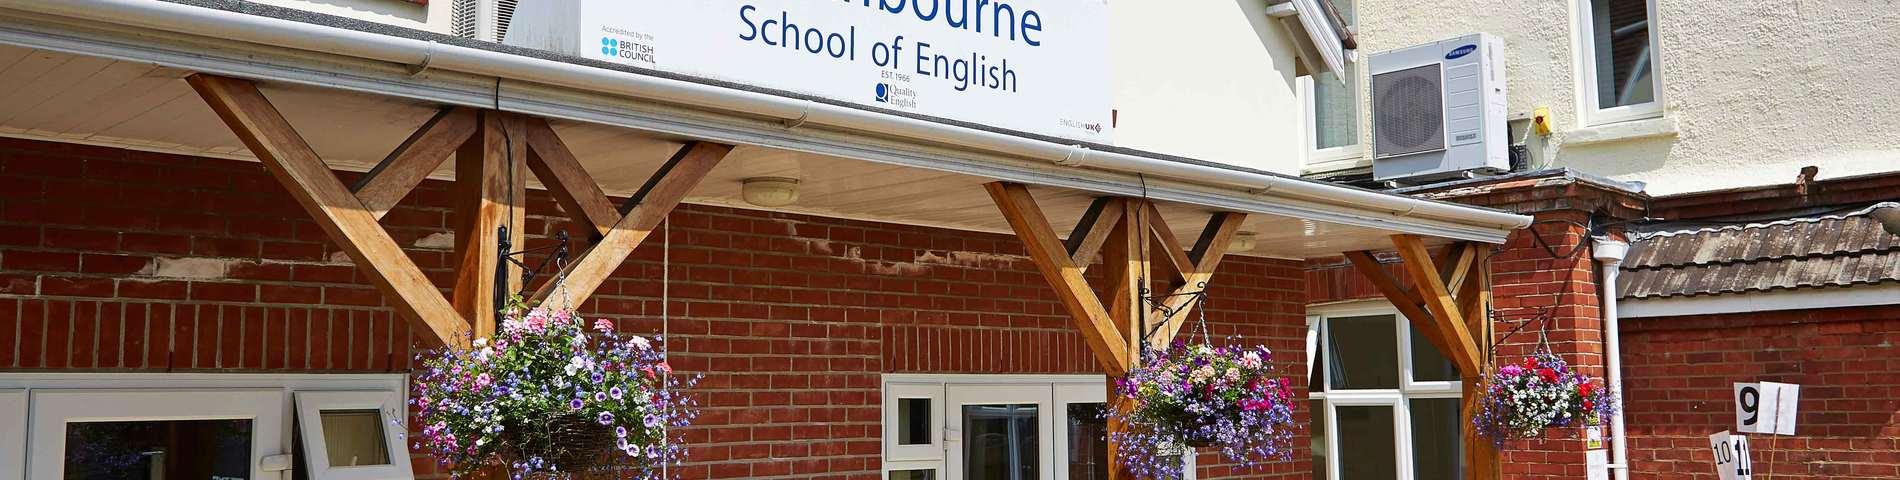 Southbourne School of English bild 1